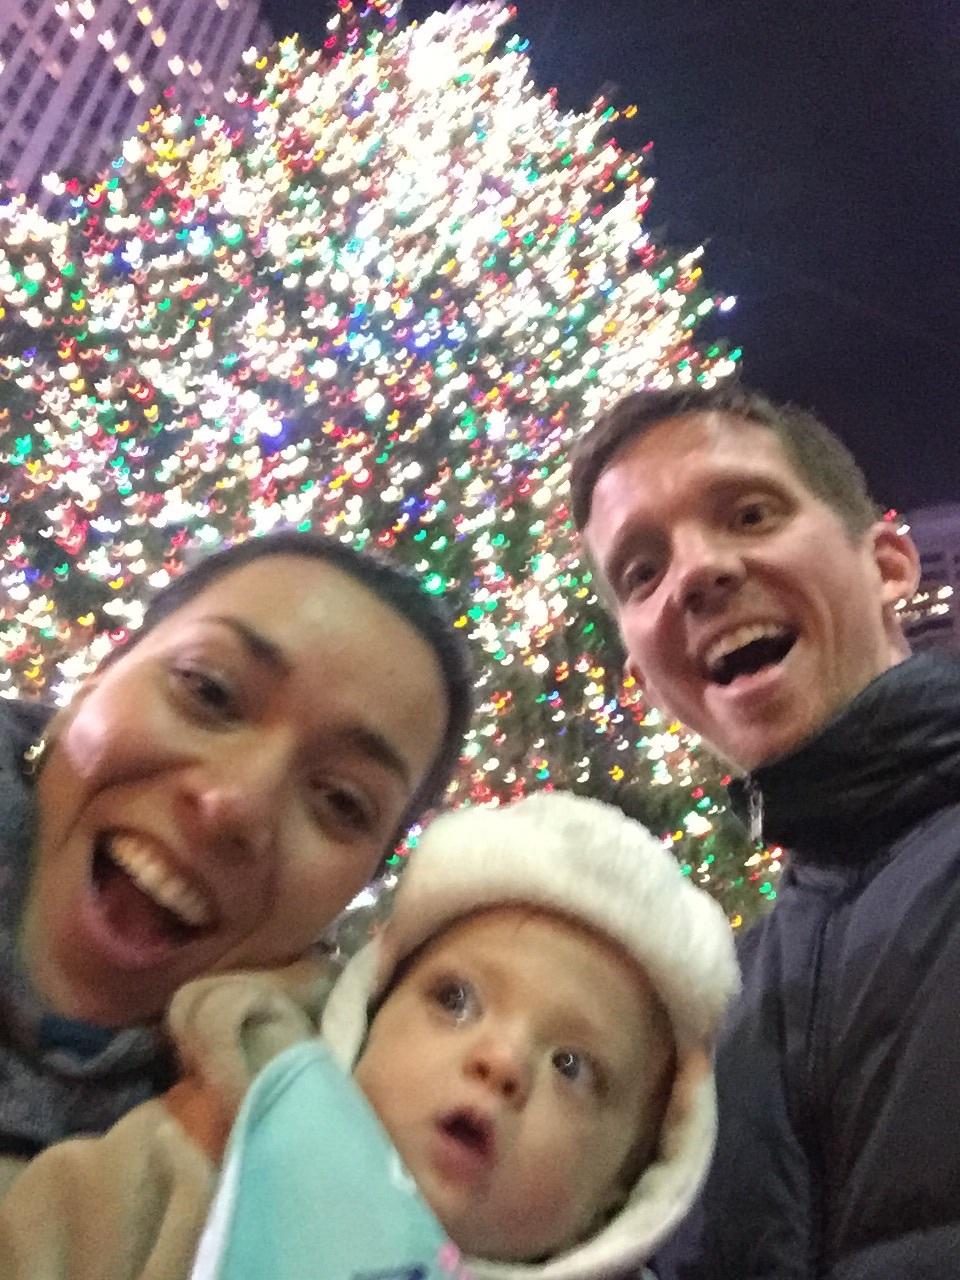 Blurry selfie at Rockefeller Center